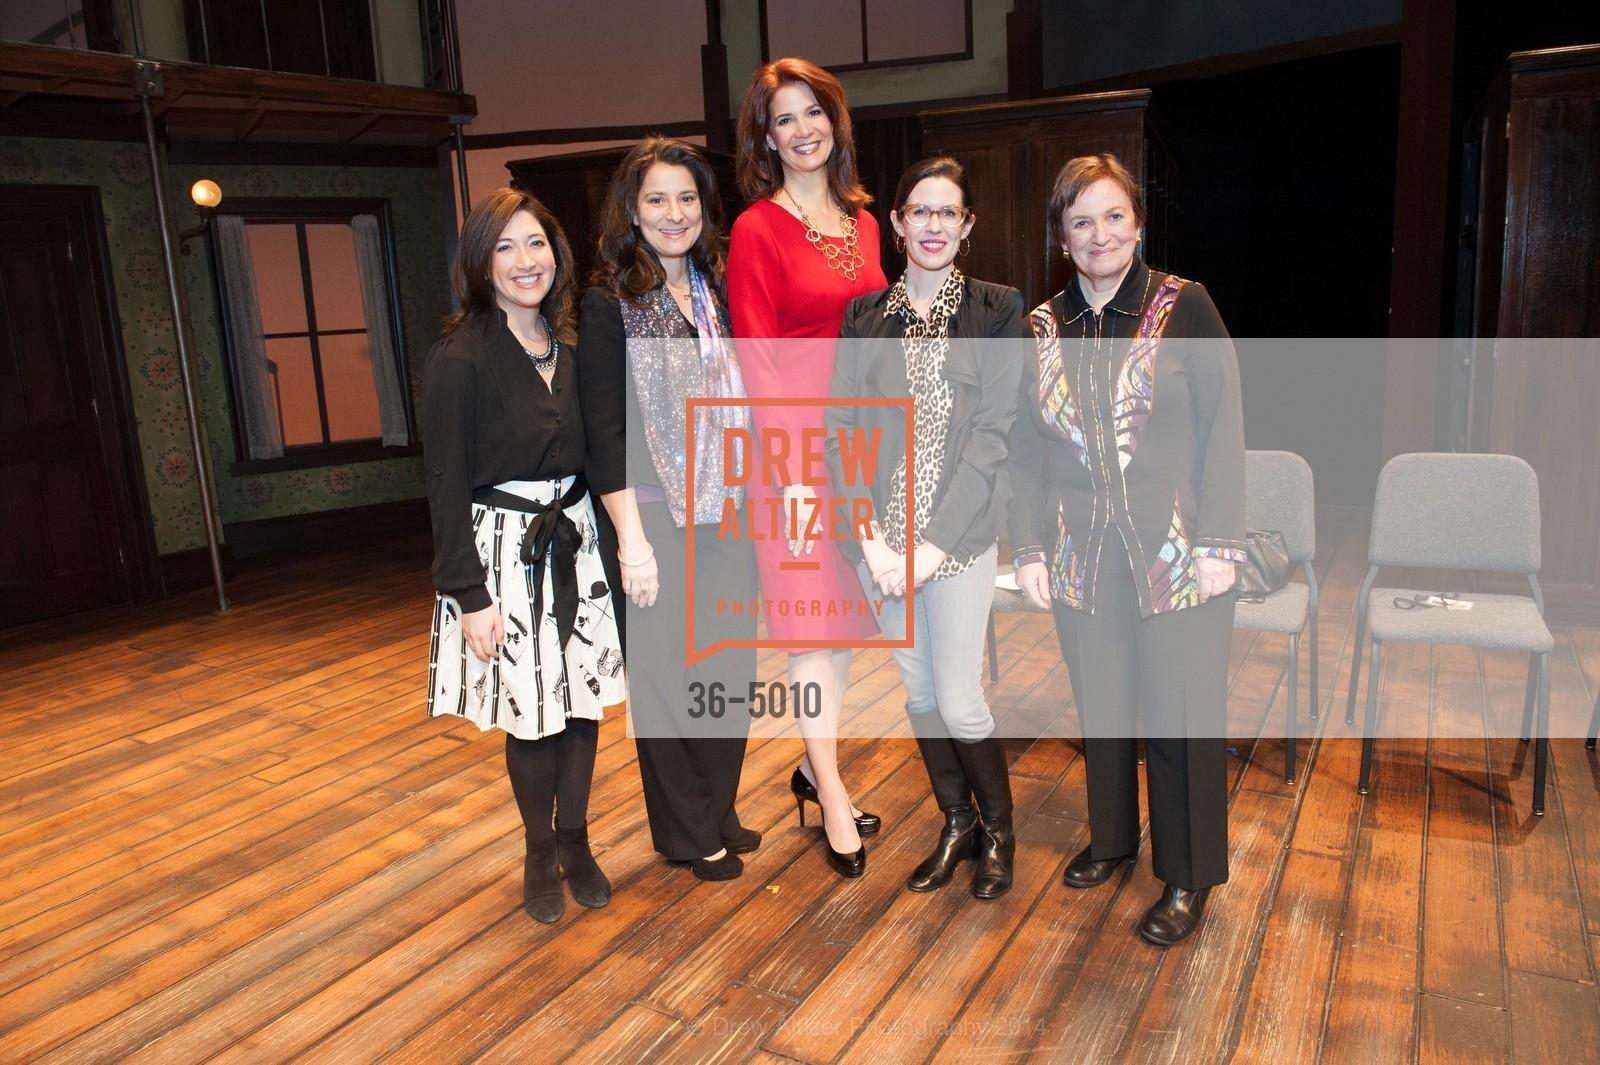 Randi Zuckerberg, Natalie Batalha, Jenny Dearborn, Lauren Gunderson, Ann Bowers, Photo #36-5010